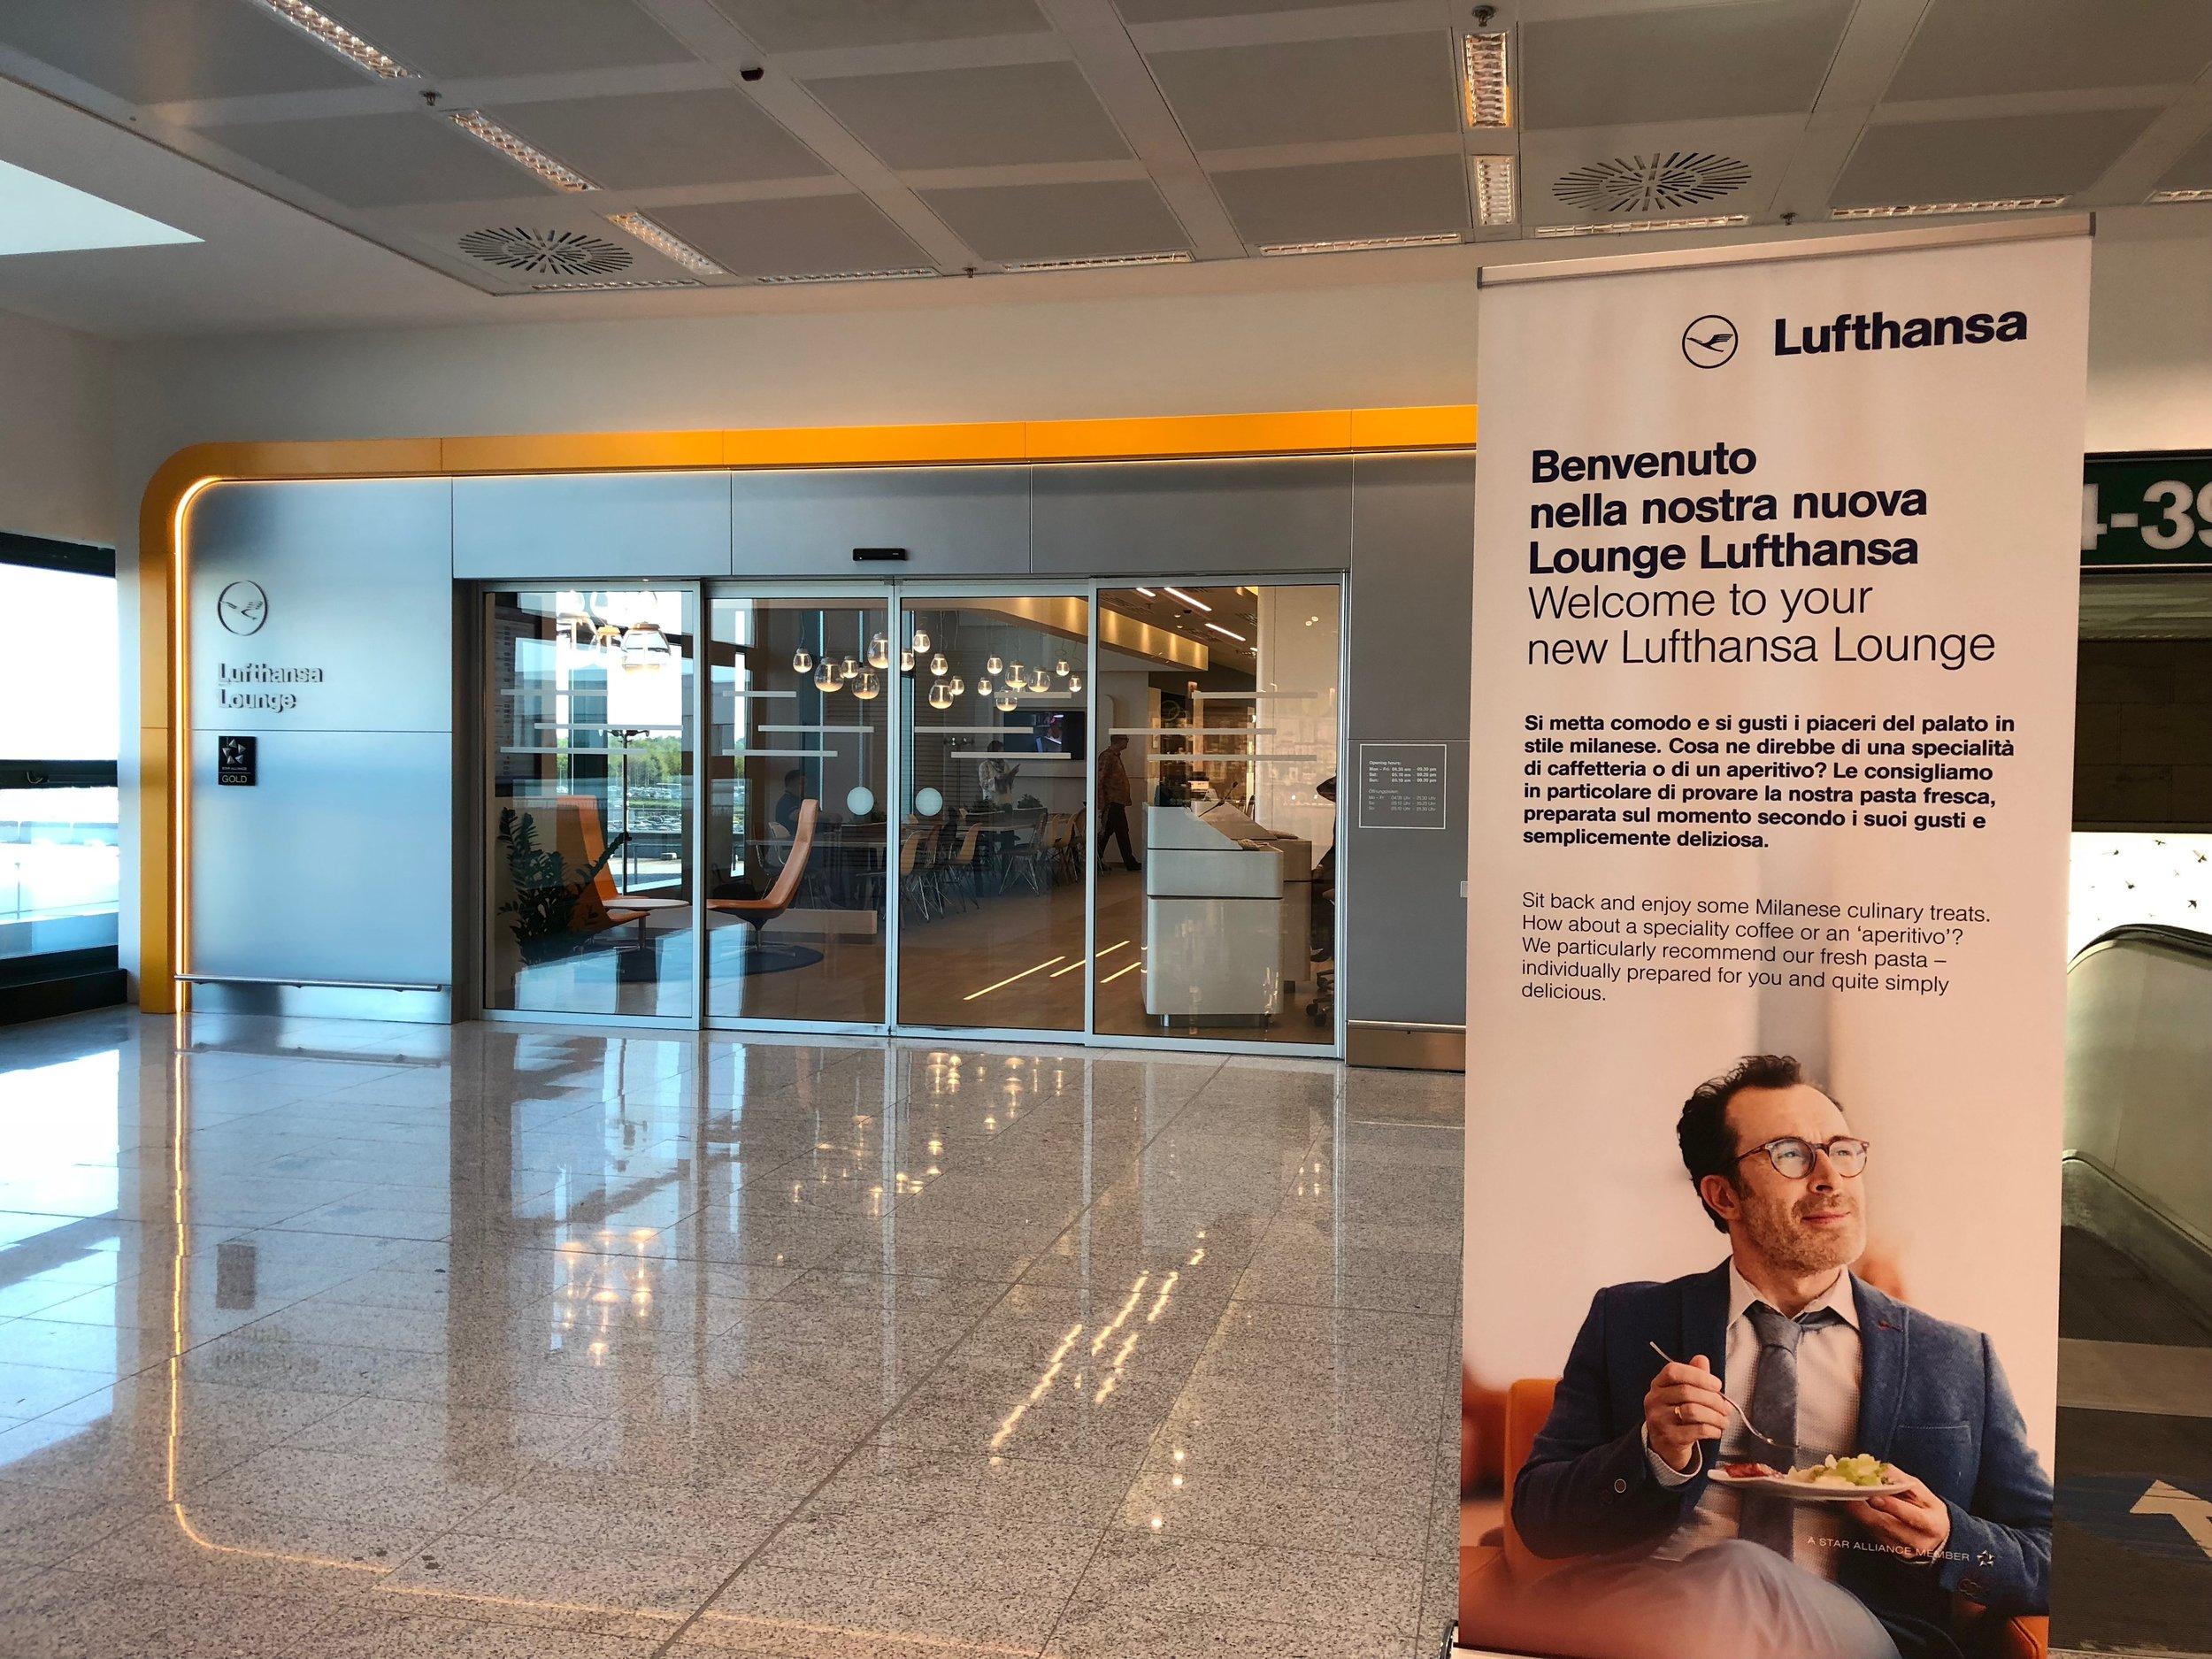 Milan Lufthansa Lounge exterior